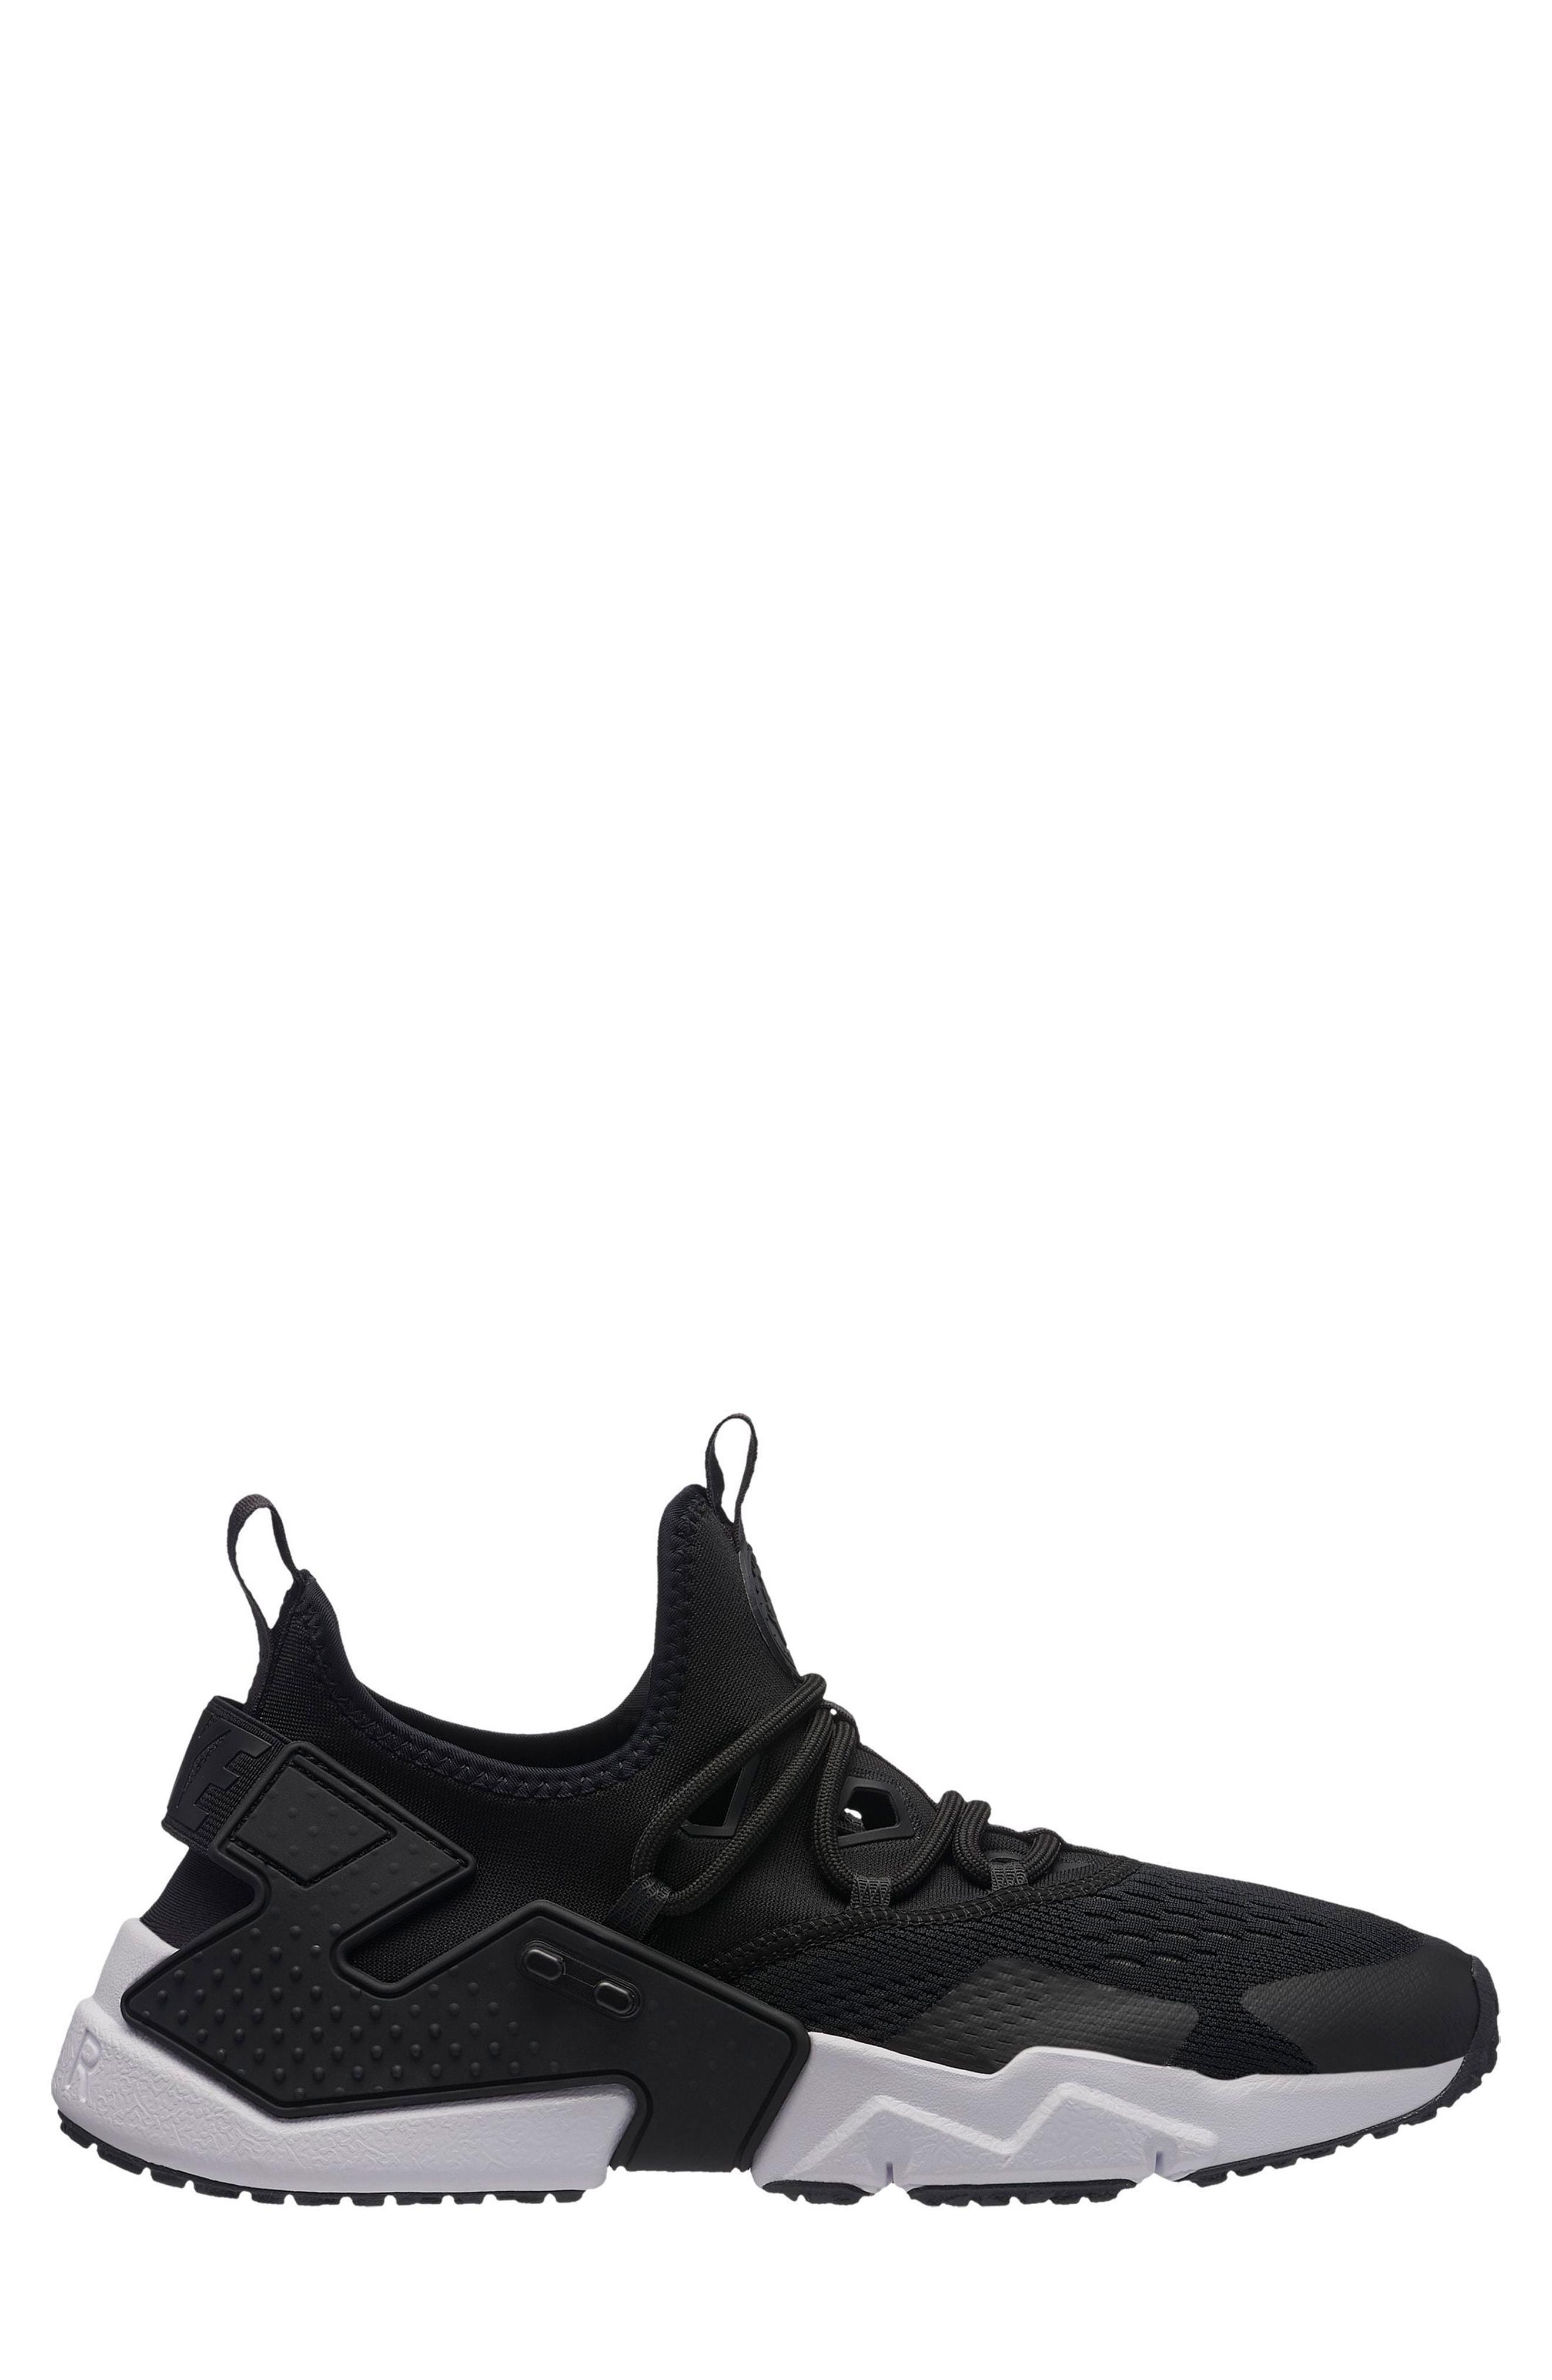 09a1e7a9ef009 Lyst - Nike Air Huarache Drift Br Trainers Black in Black for Men